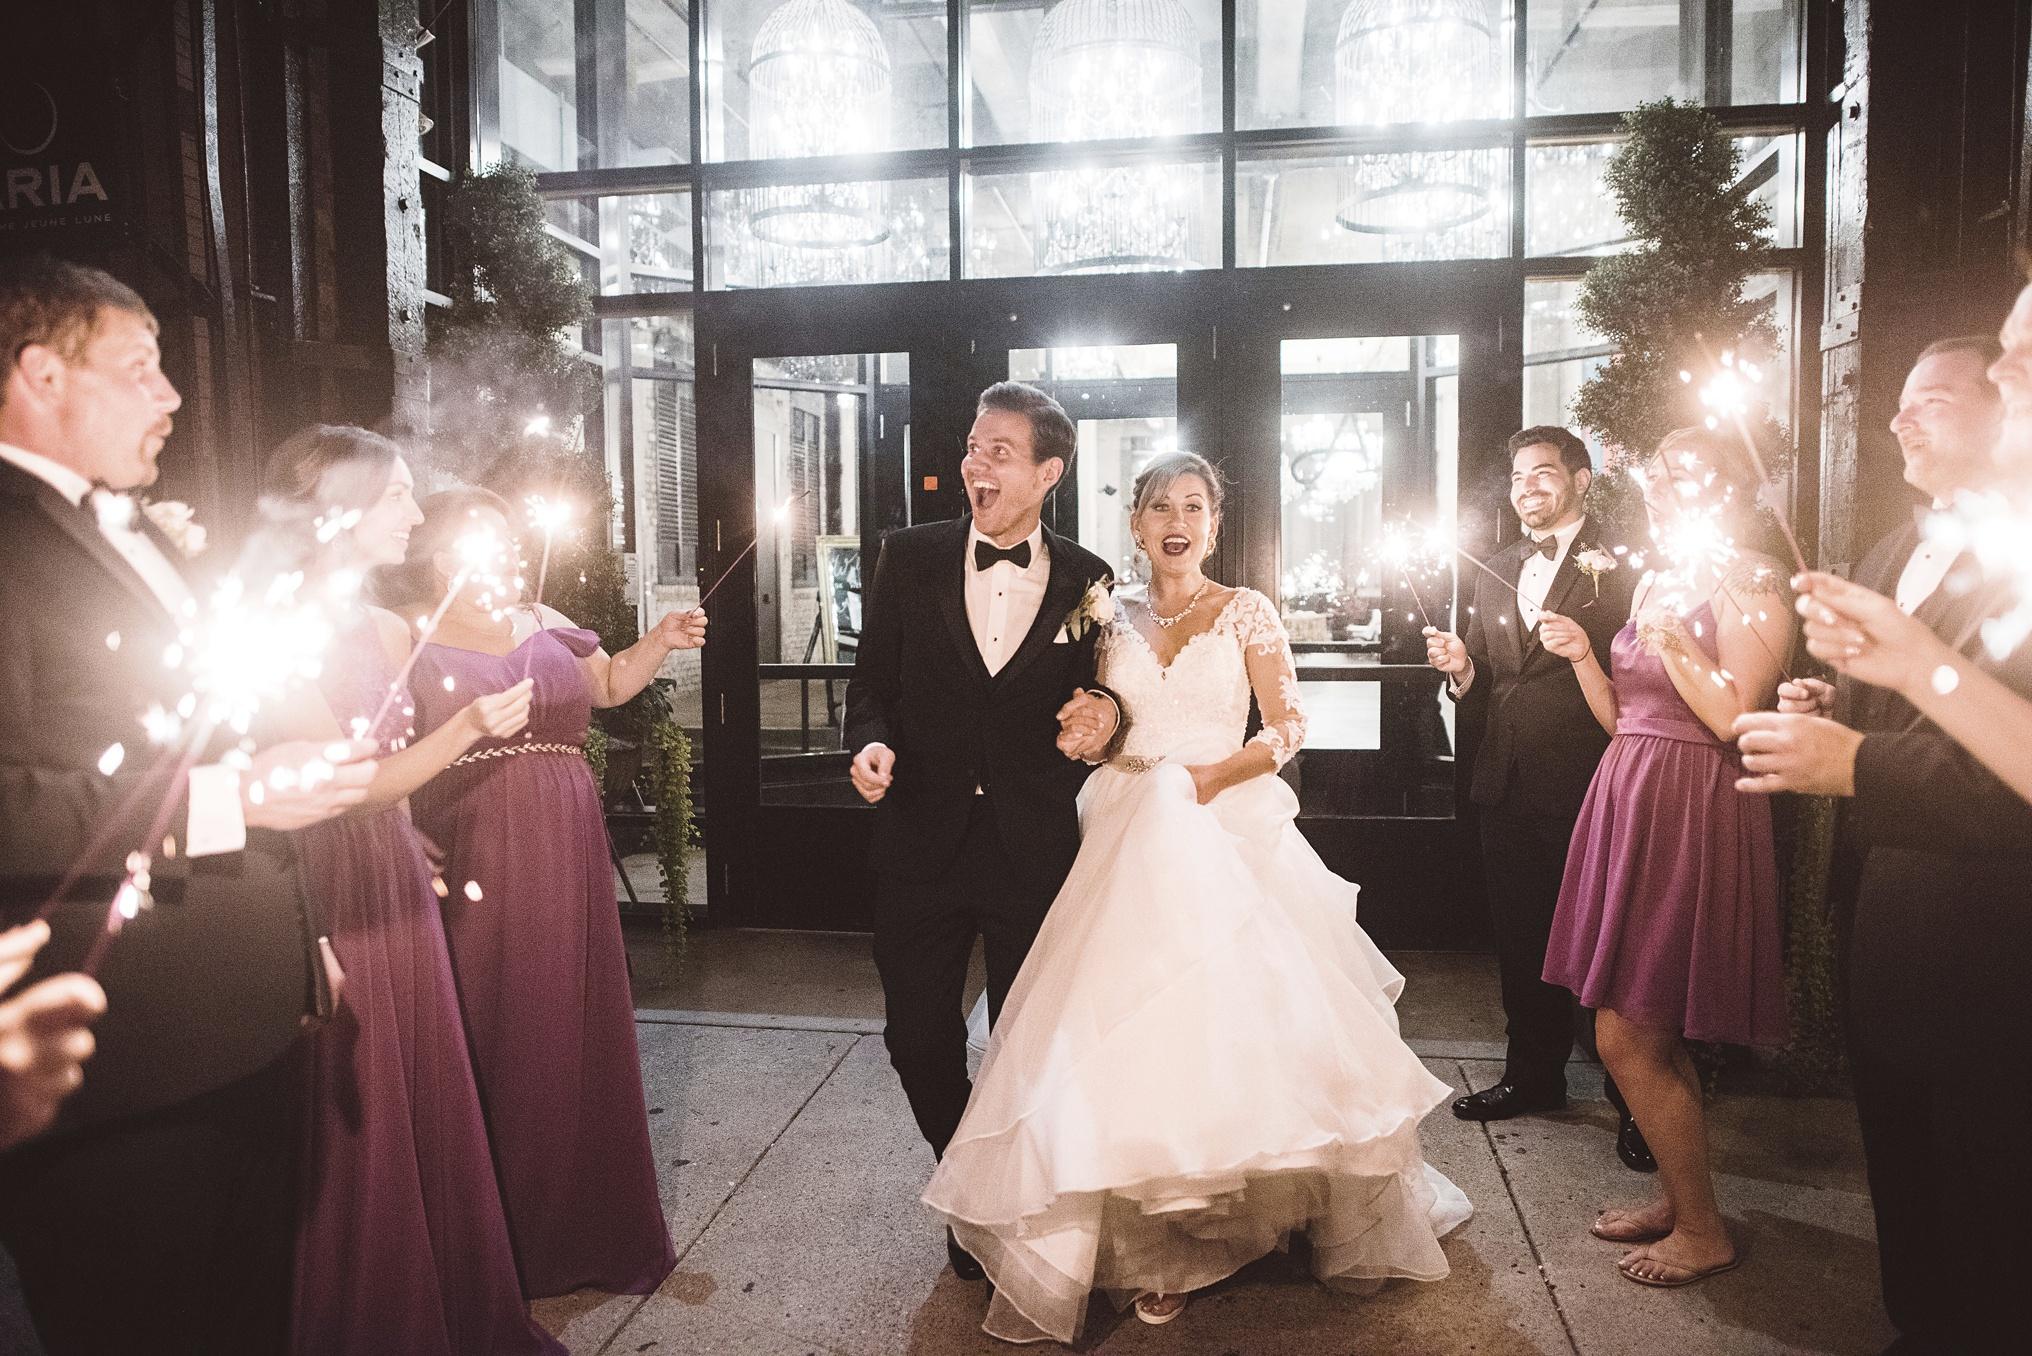 best_wedding_photography_2017_by_lucas_botz_photography_043.jpg